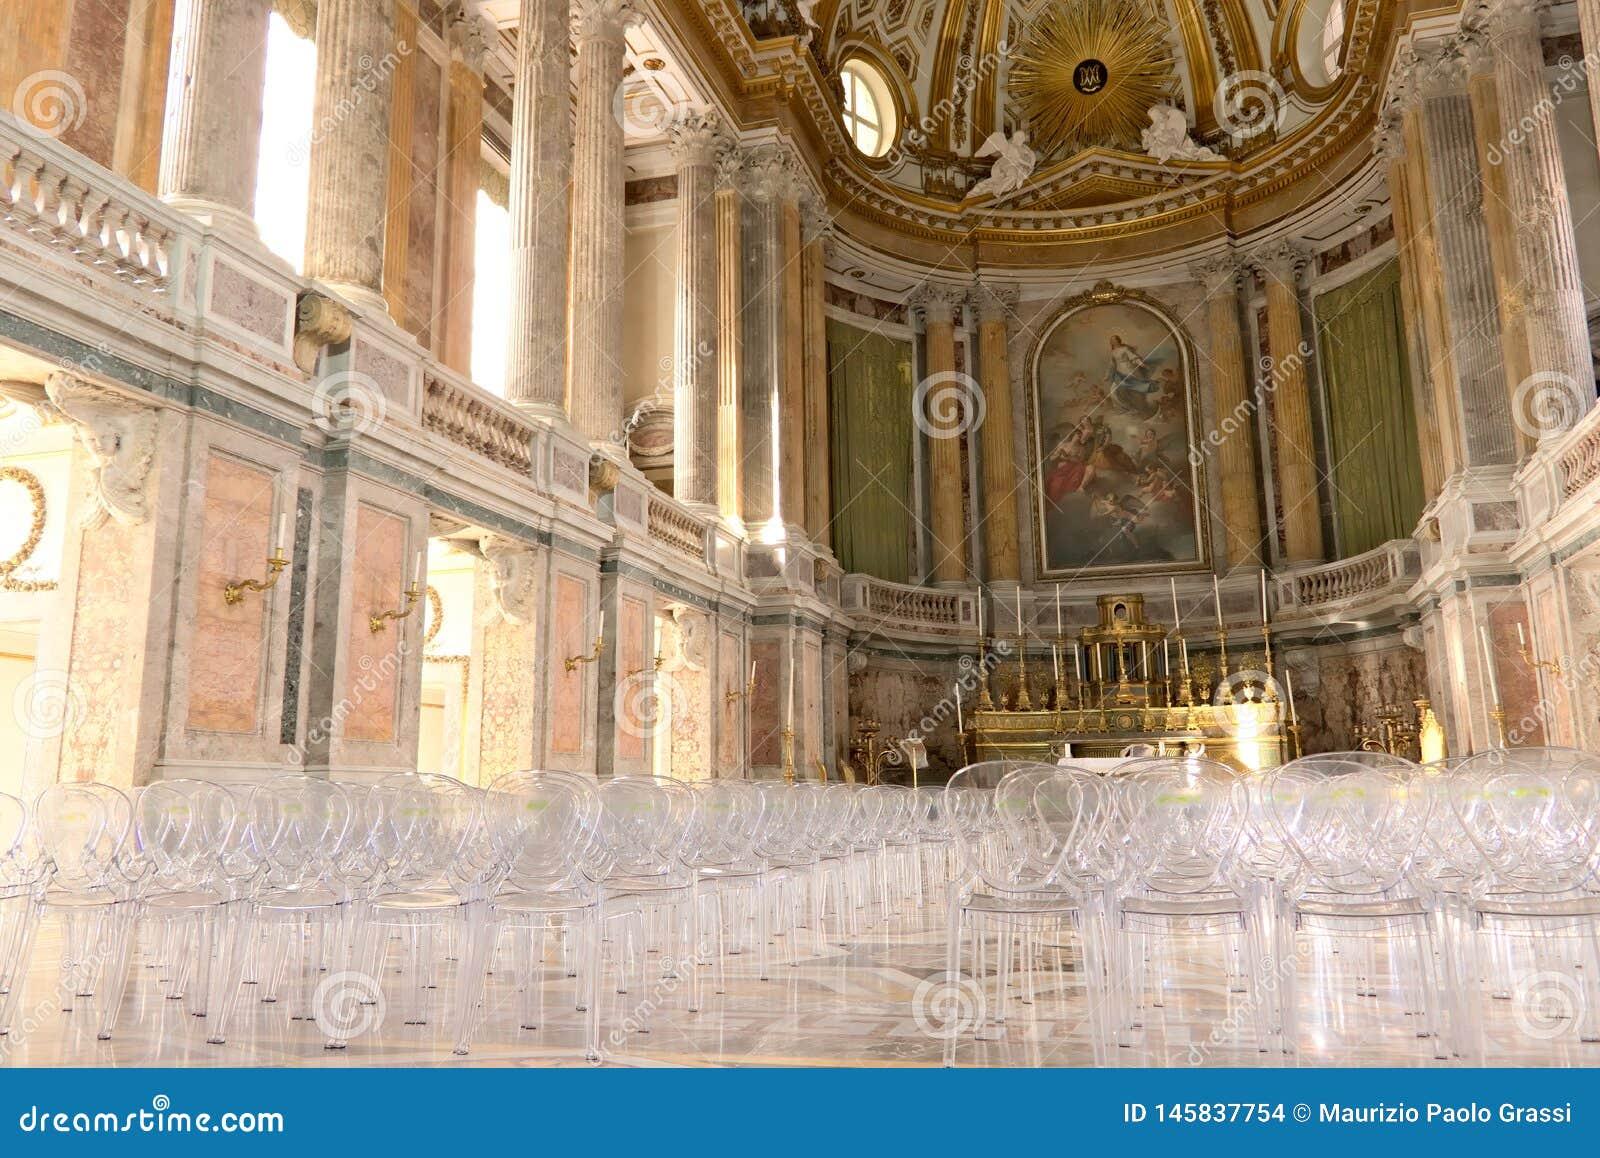 Reggia二卡塞尔塔,意大利 10/27/2018 教堂的内部在宫殿里面的 当代耐热有机玻璃椅子